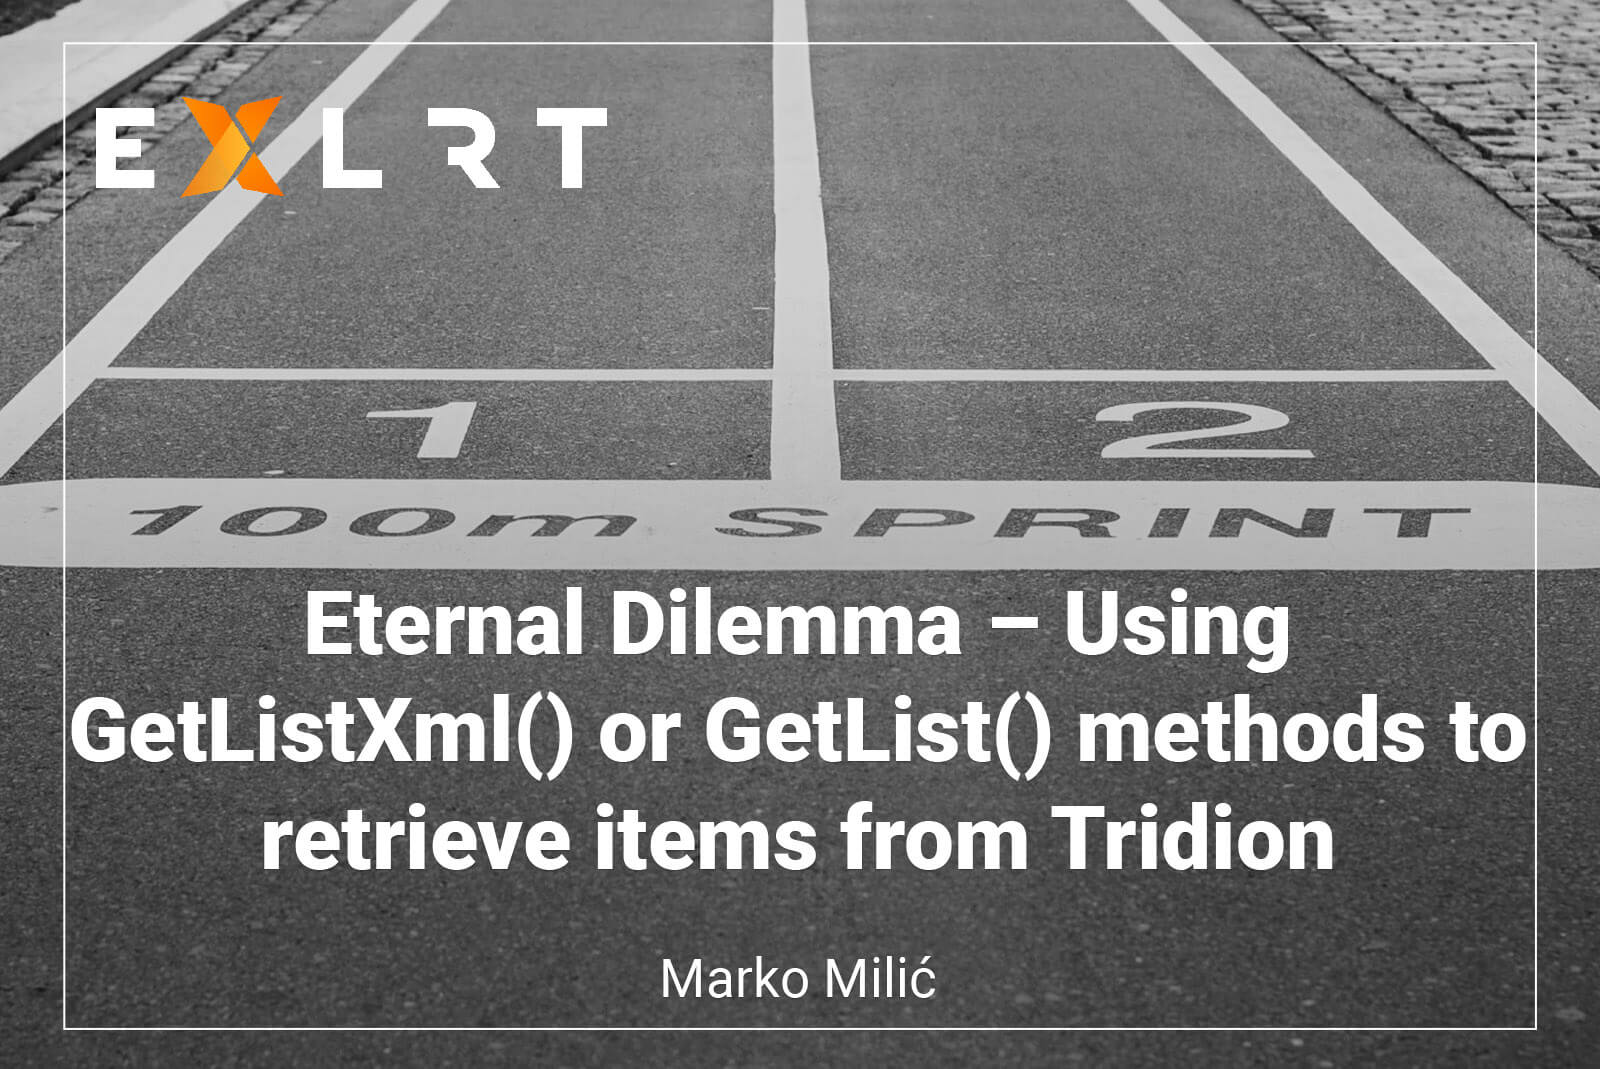 Eternal Dilemma – Using GetListXml() or GetList() methods to retrieve items from Tridion